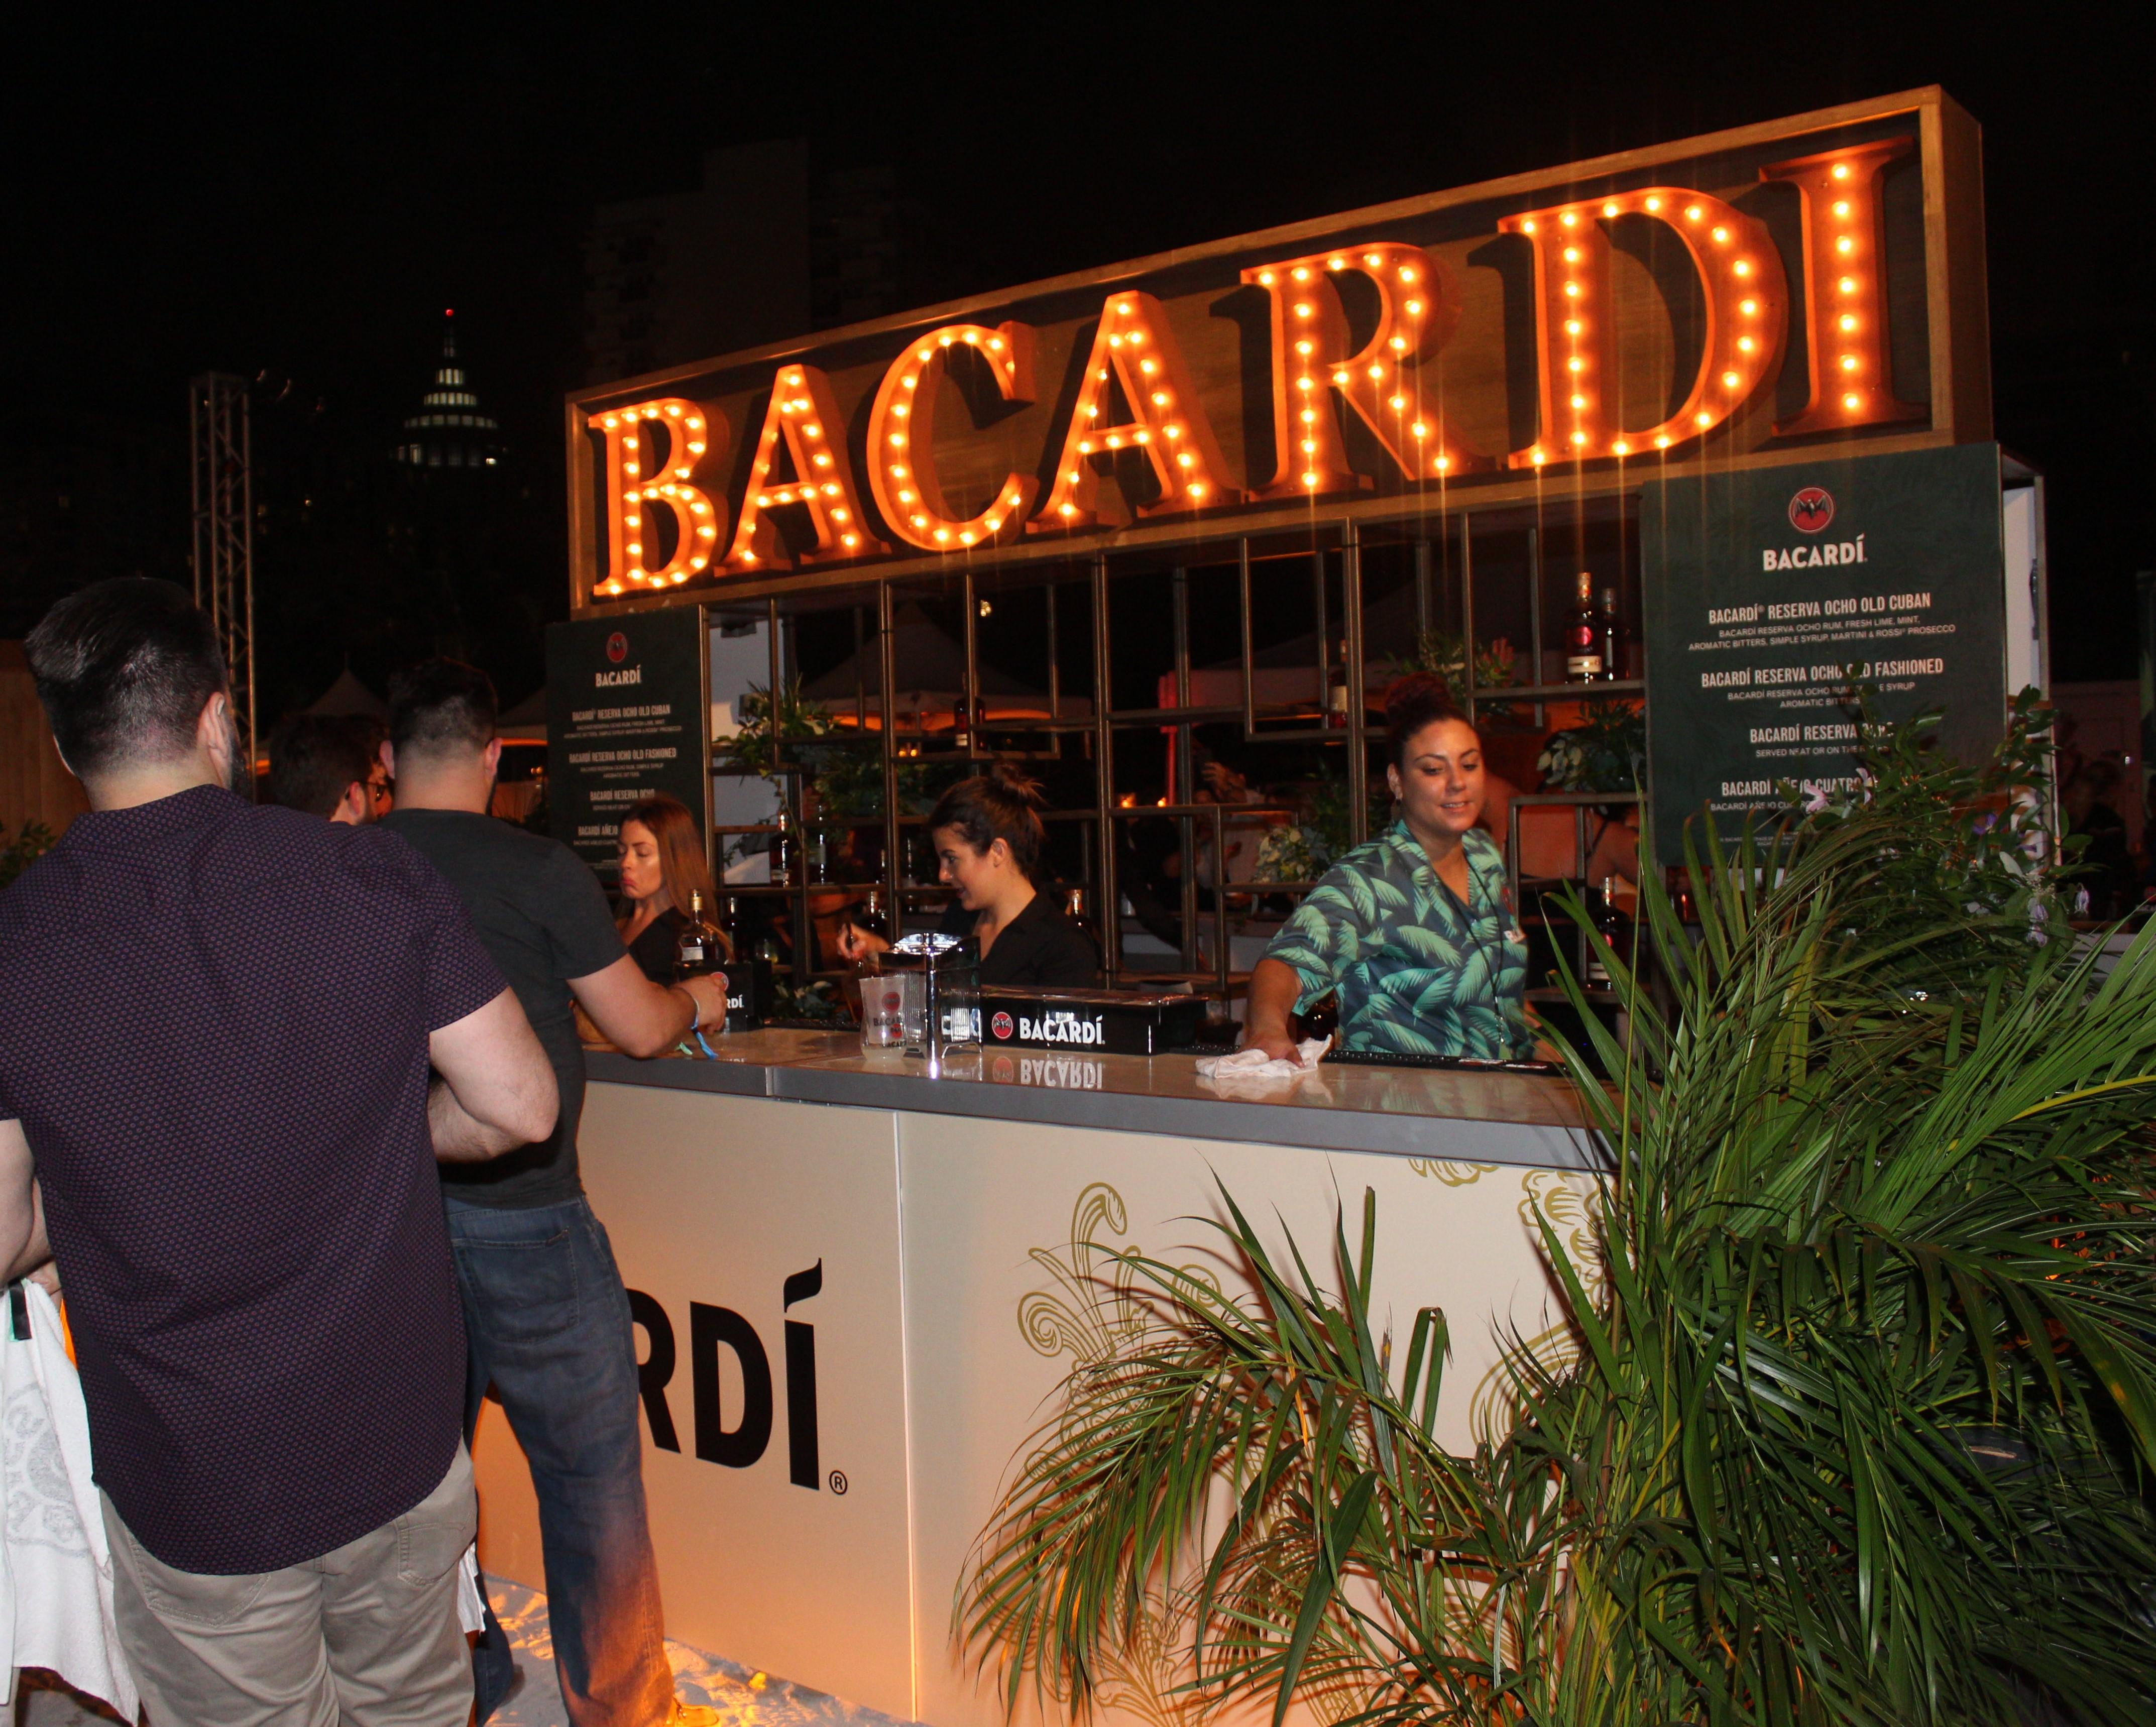 Sobewff 2018 Bacardi Rum Amp Bass Beach Party Recap